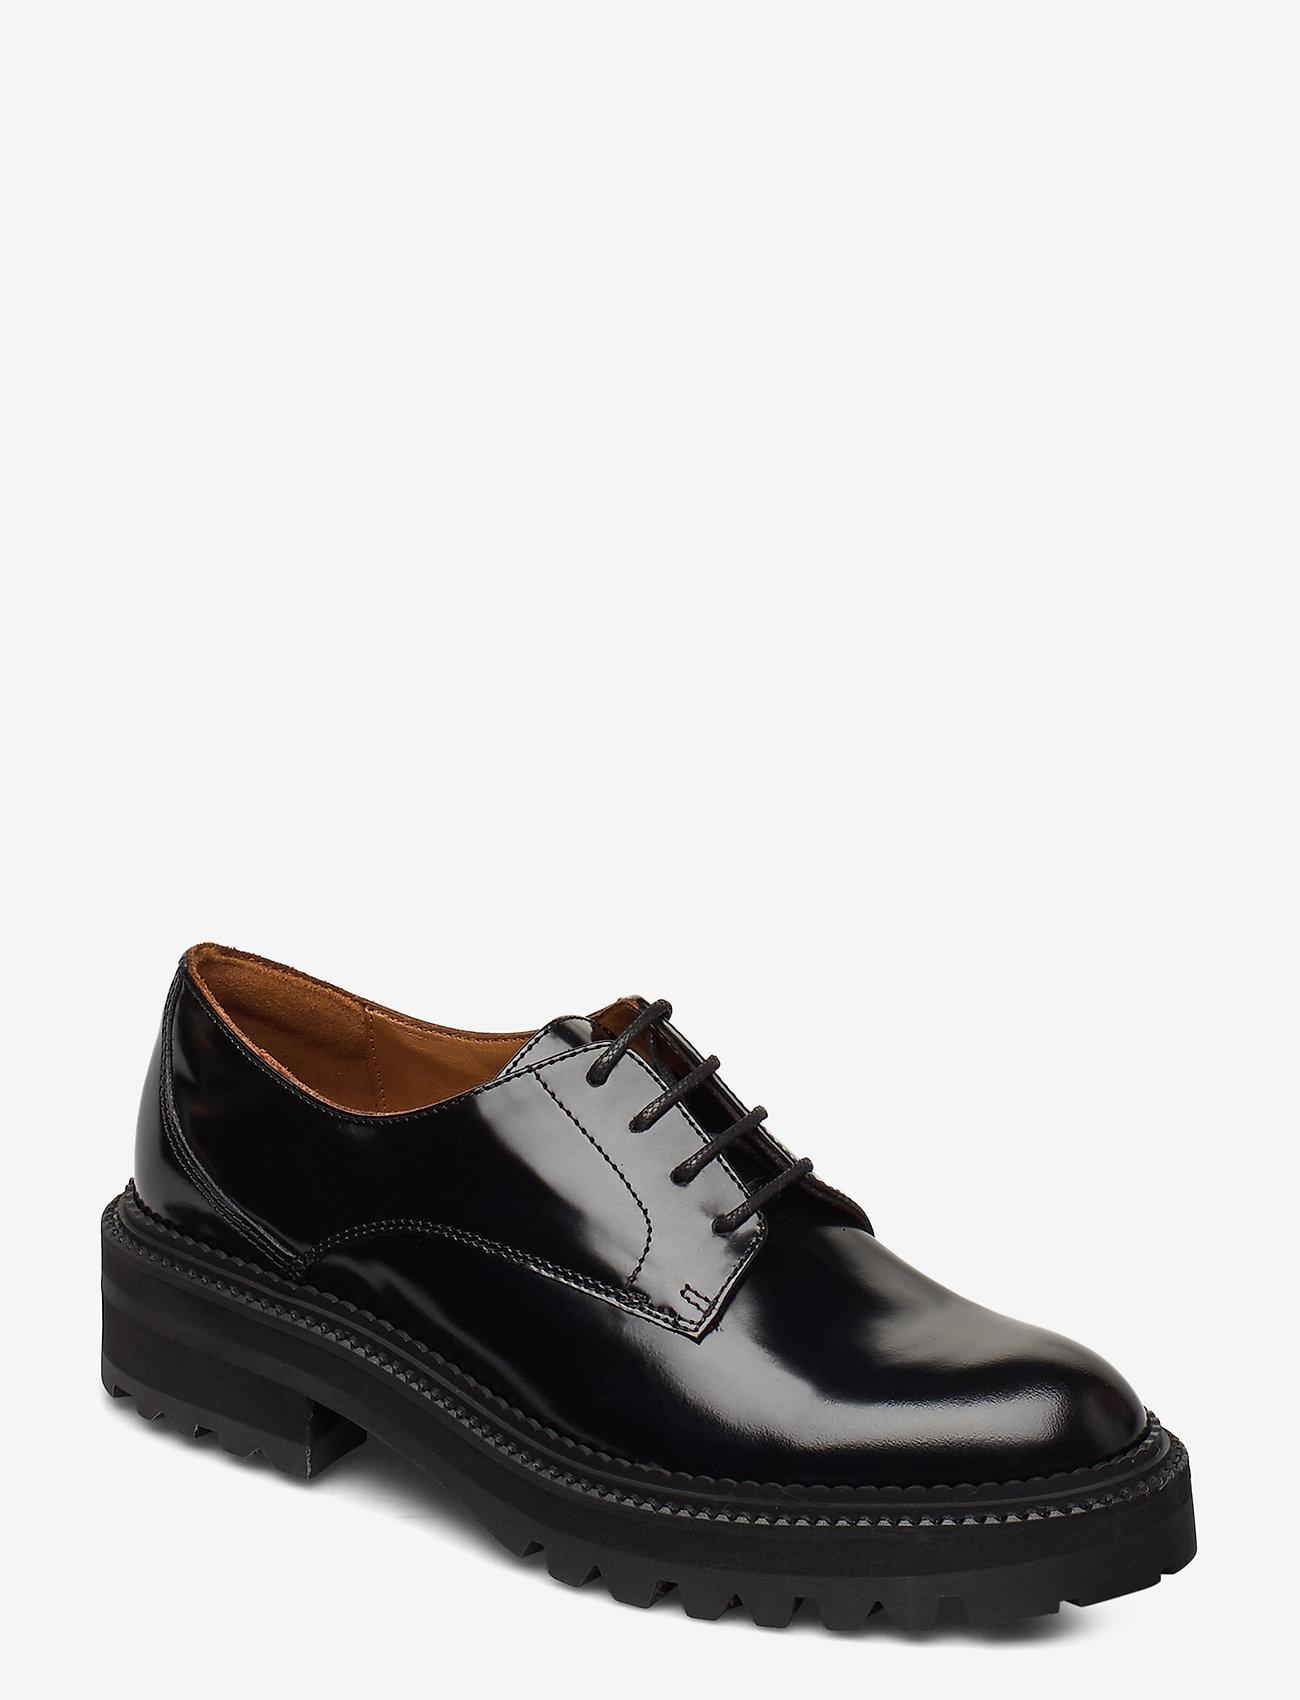 Billi Bi - Shoes 14717 - buty sznurowane - black polido  900 - 0